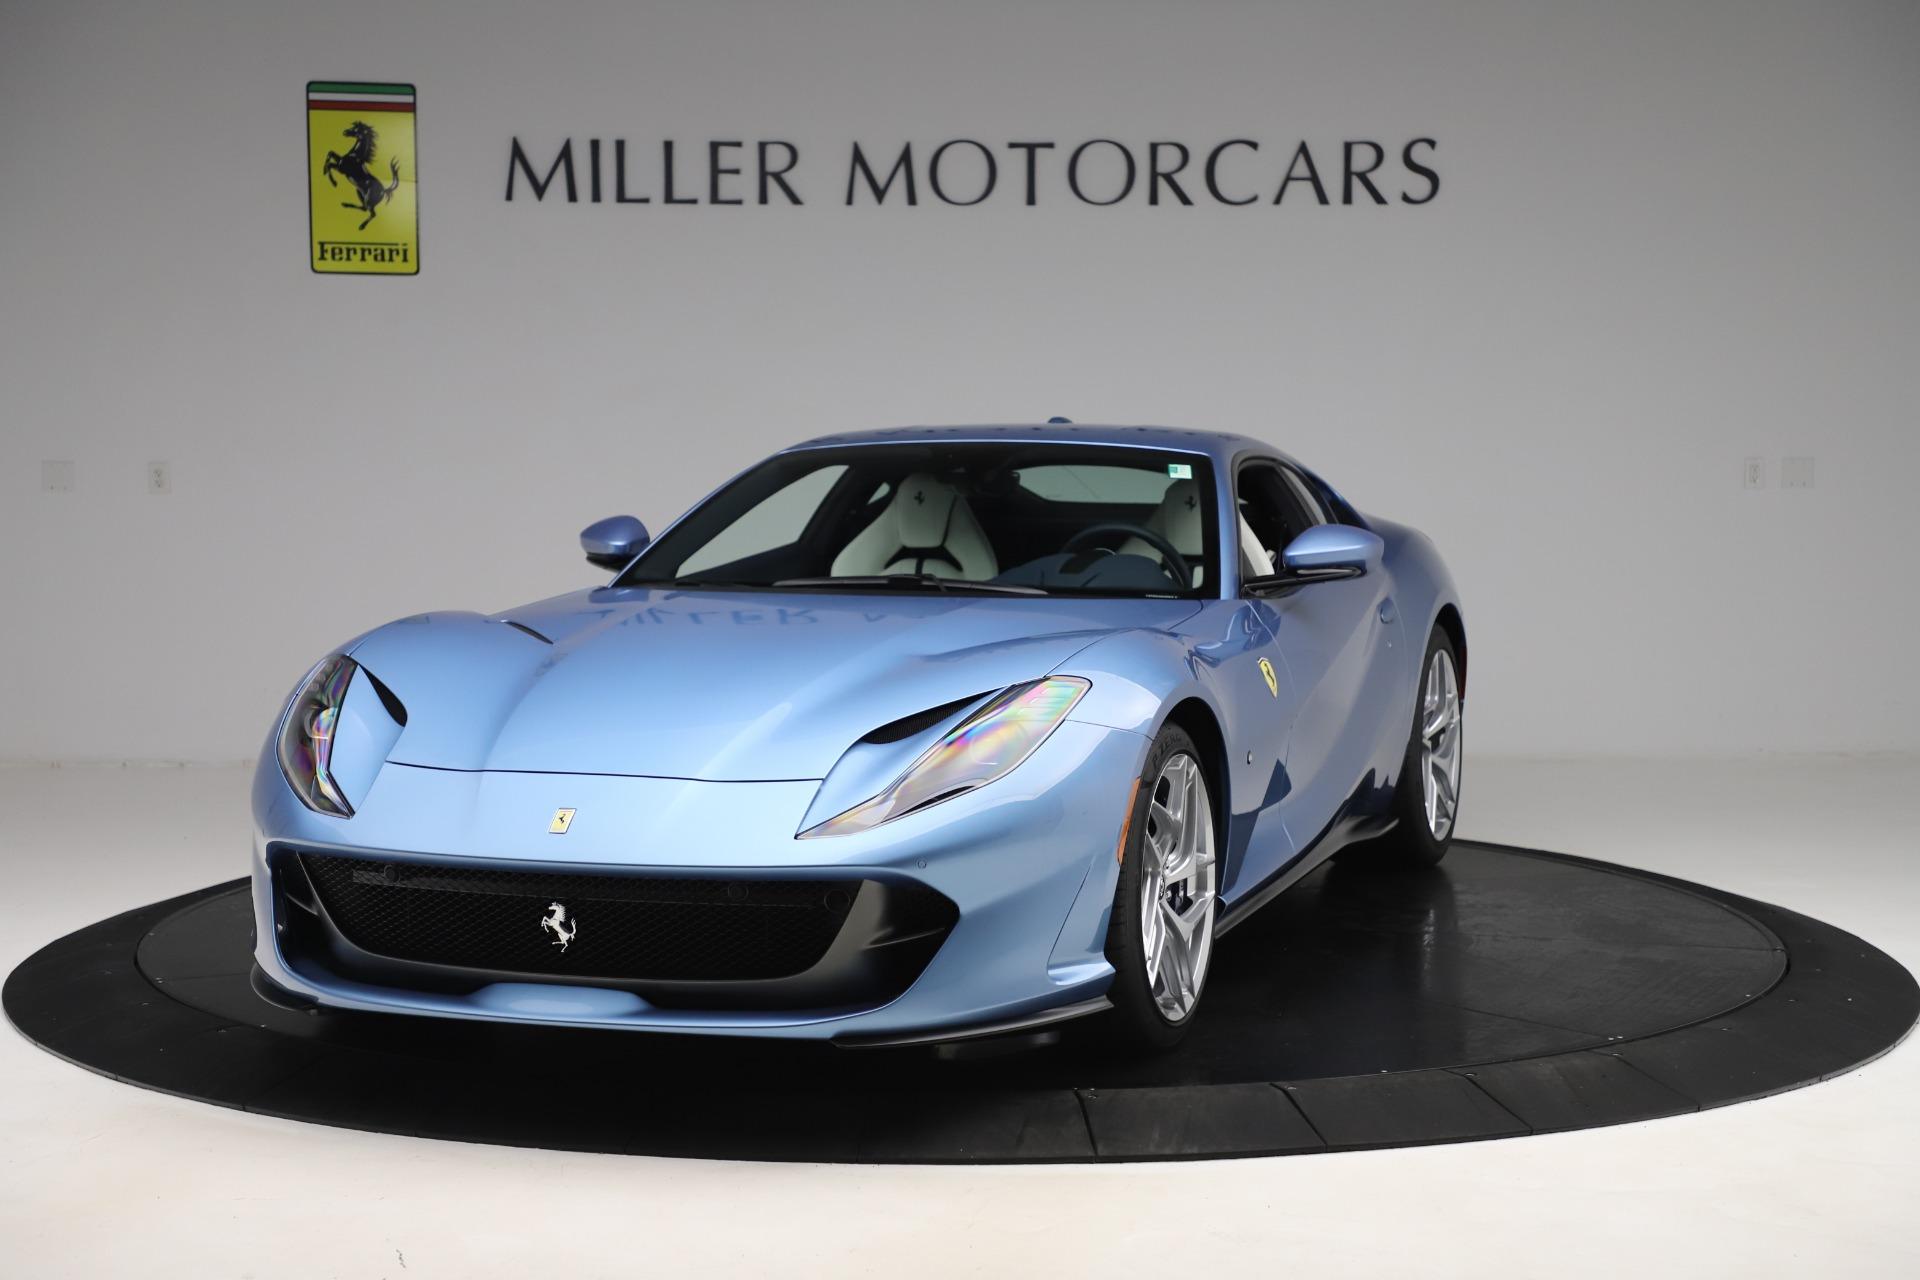 Pre Owned 2020 Ferrari 812 Superfast For Sale Ferrari Of Greenwich Stock 4670